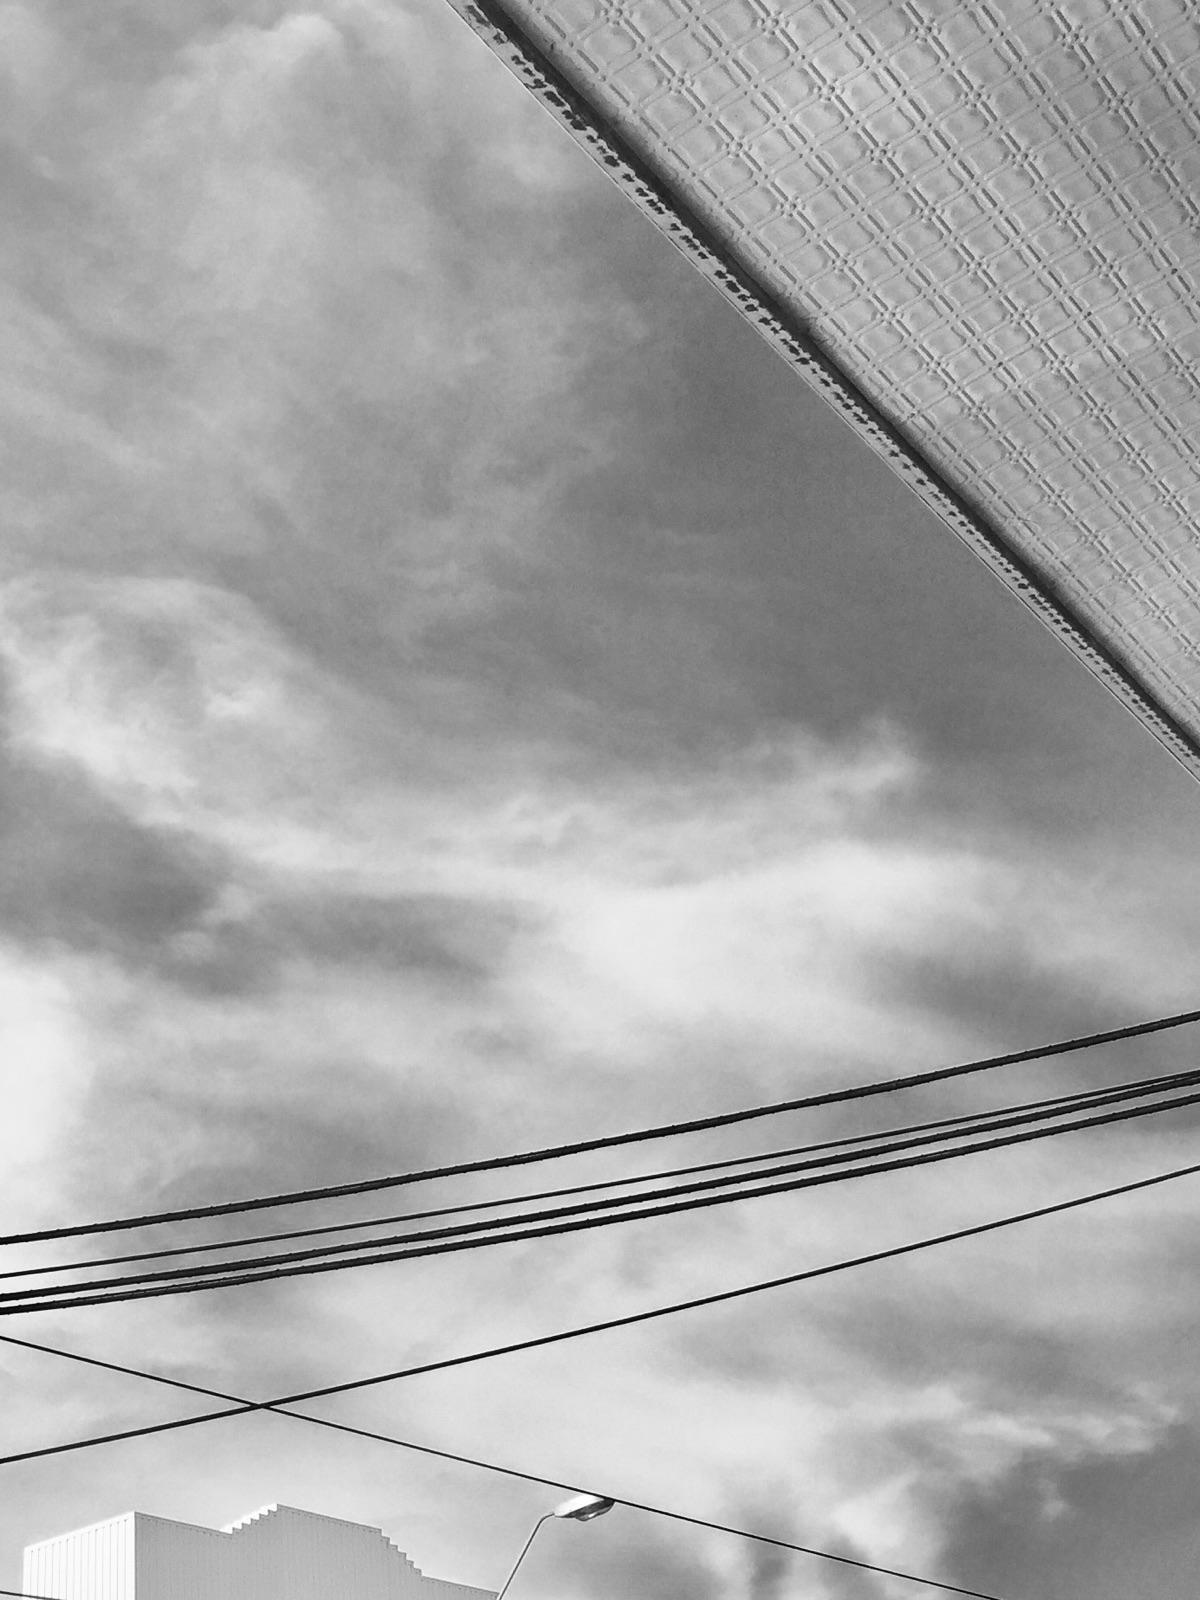 Melbourne 2017 - photography, iphone - vrenolds | ello